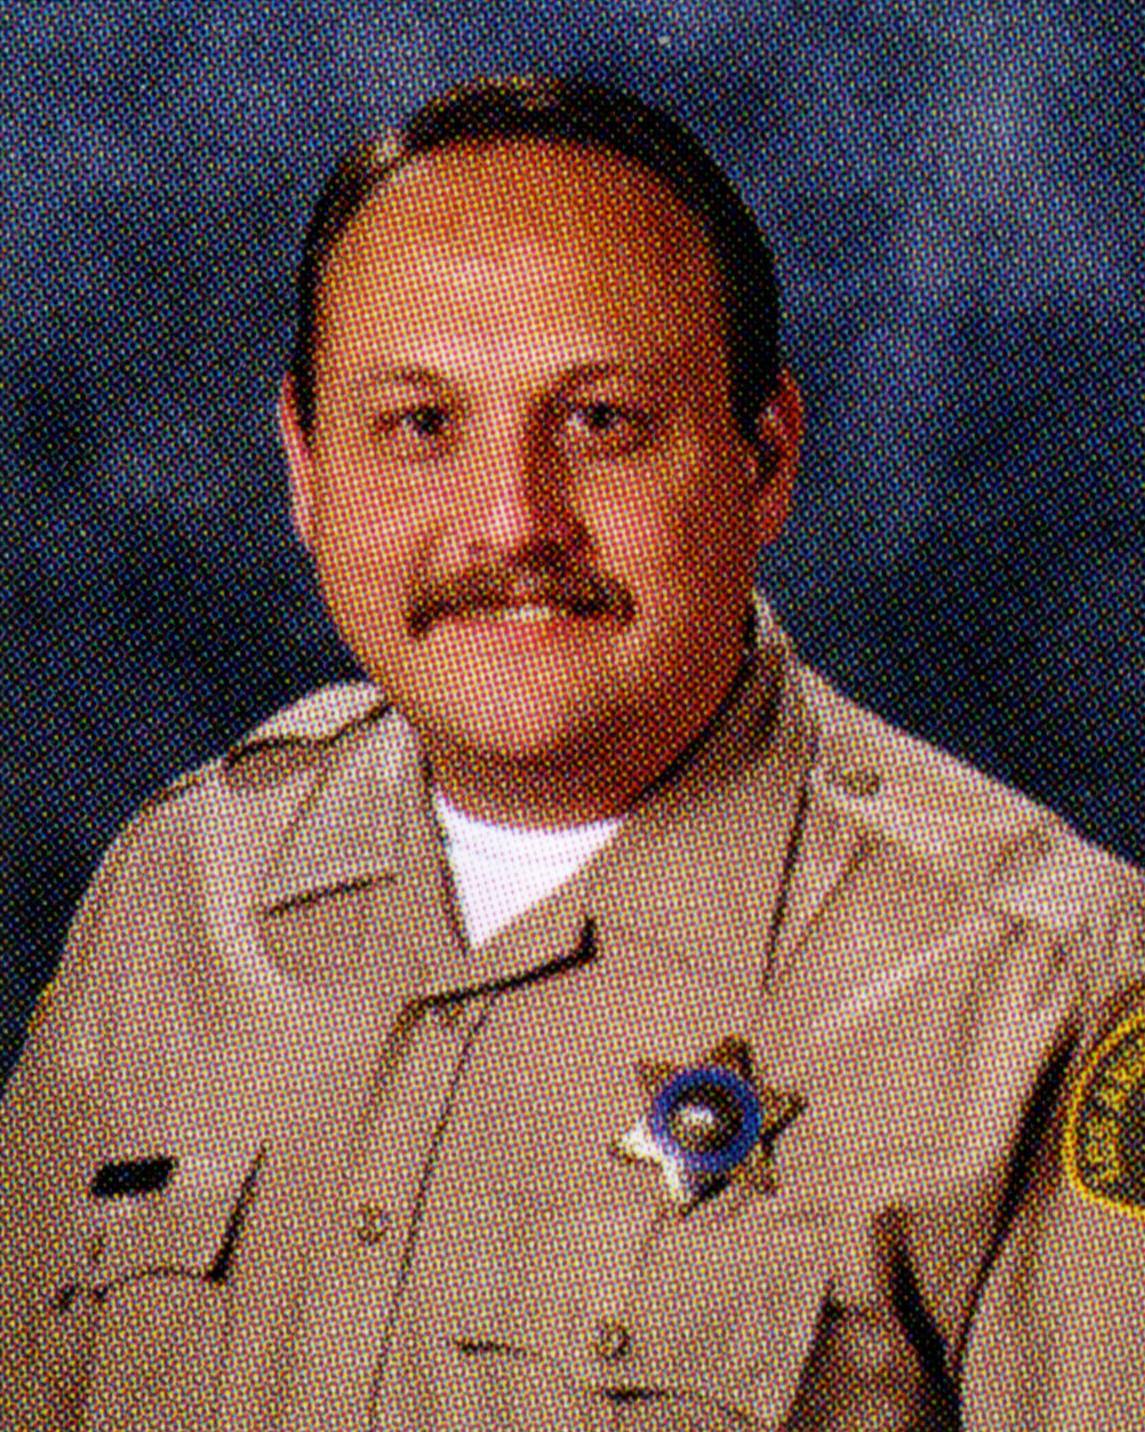 Deputy Jimmie Pate